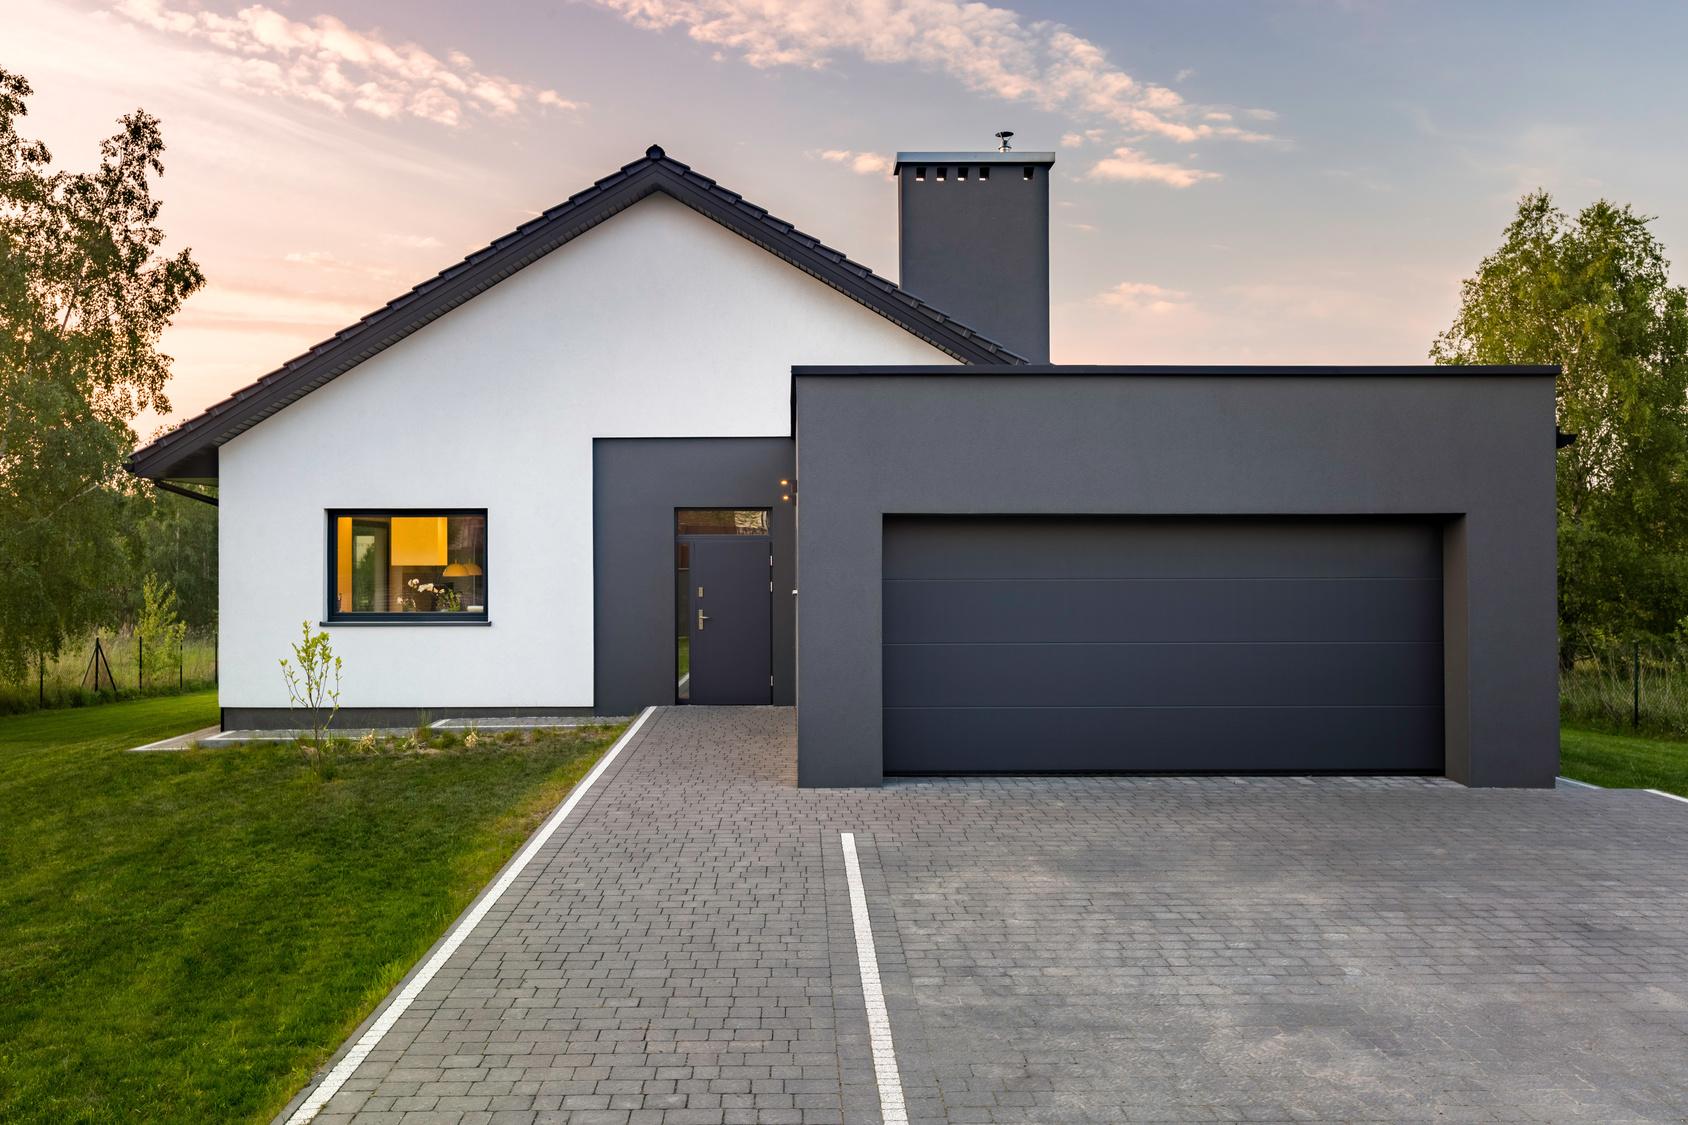 les portails alu avantages et inconv nients copaero. Black Bedroom Furniture Sets. Home Design Ideas